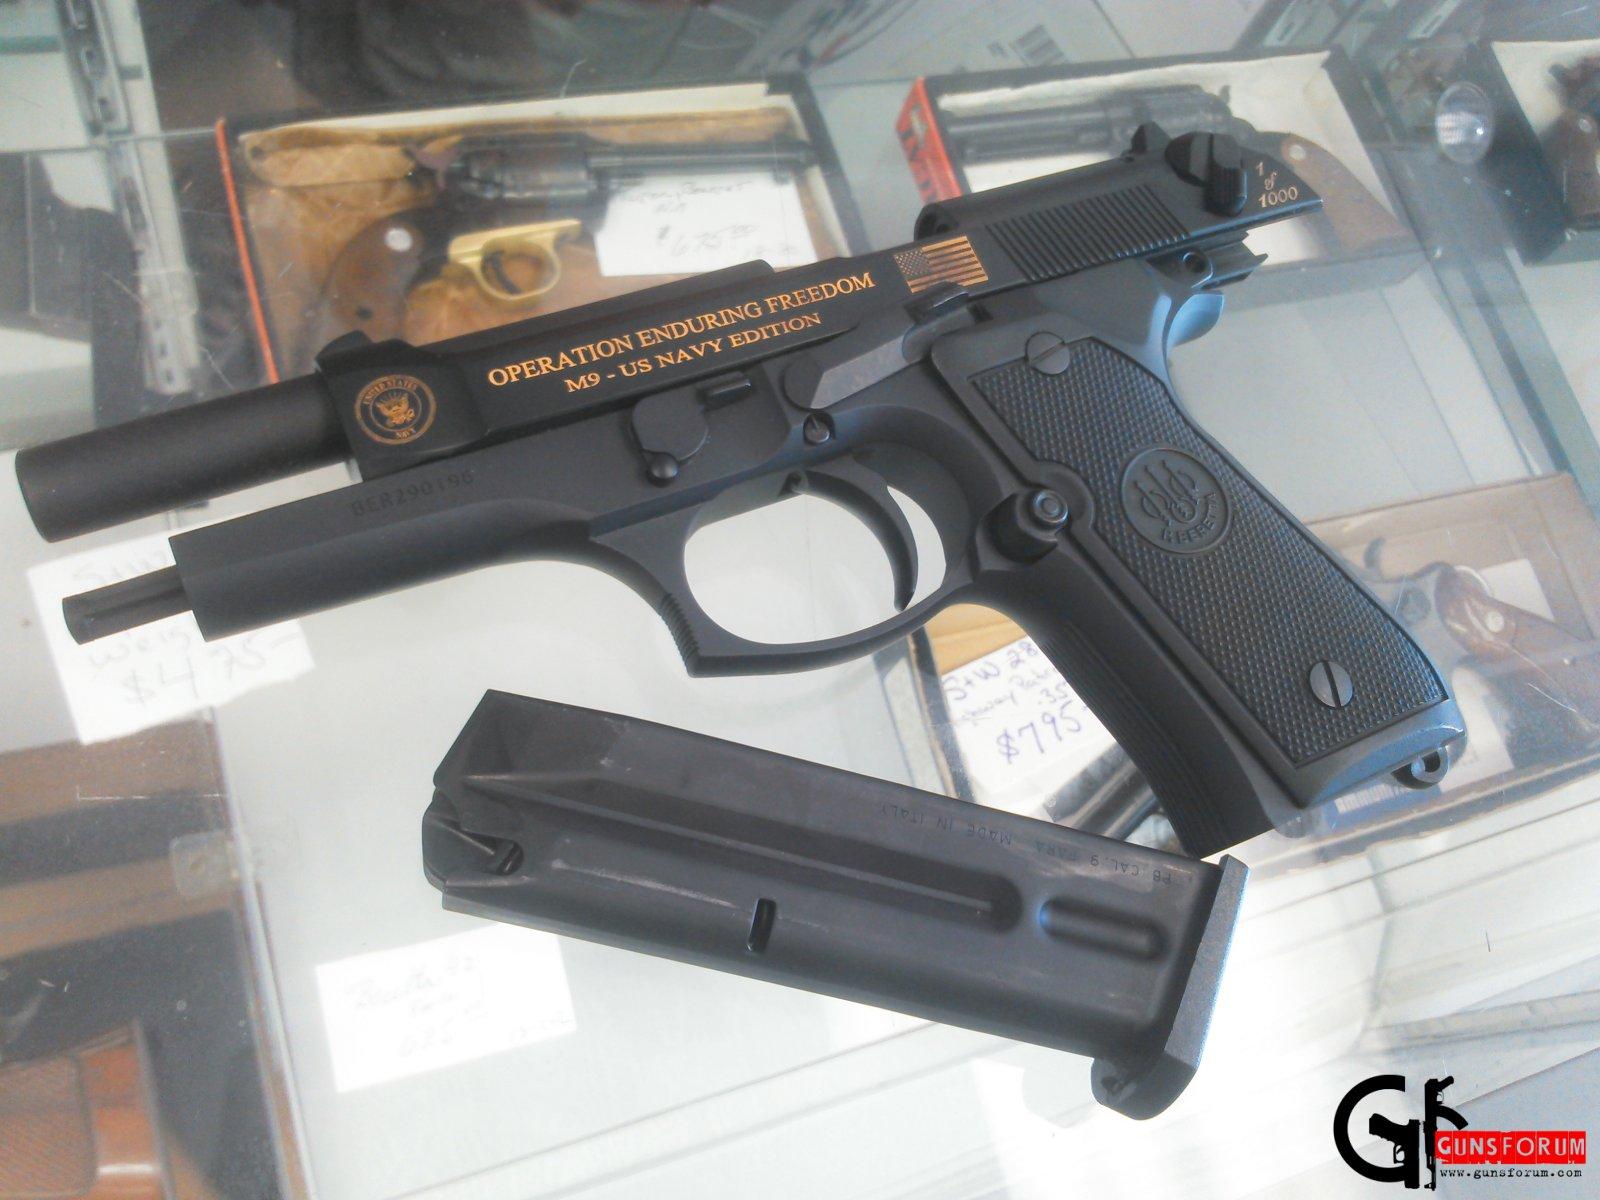 Beretta 92 Operation Enduring Freedom Naval commemorative handgun